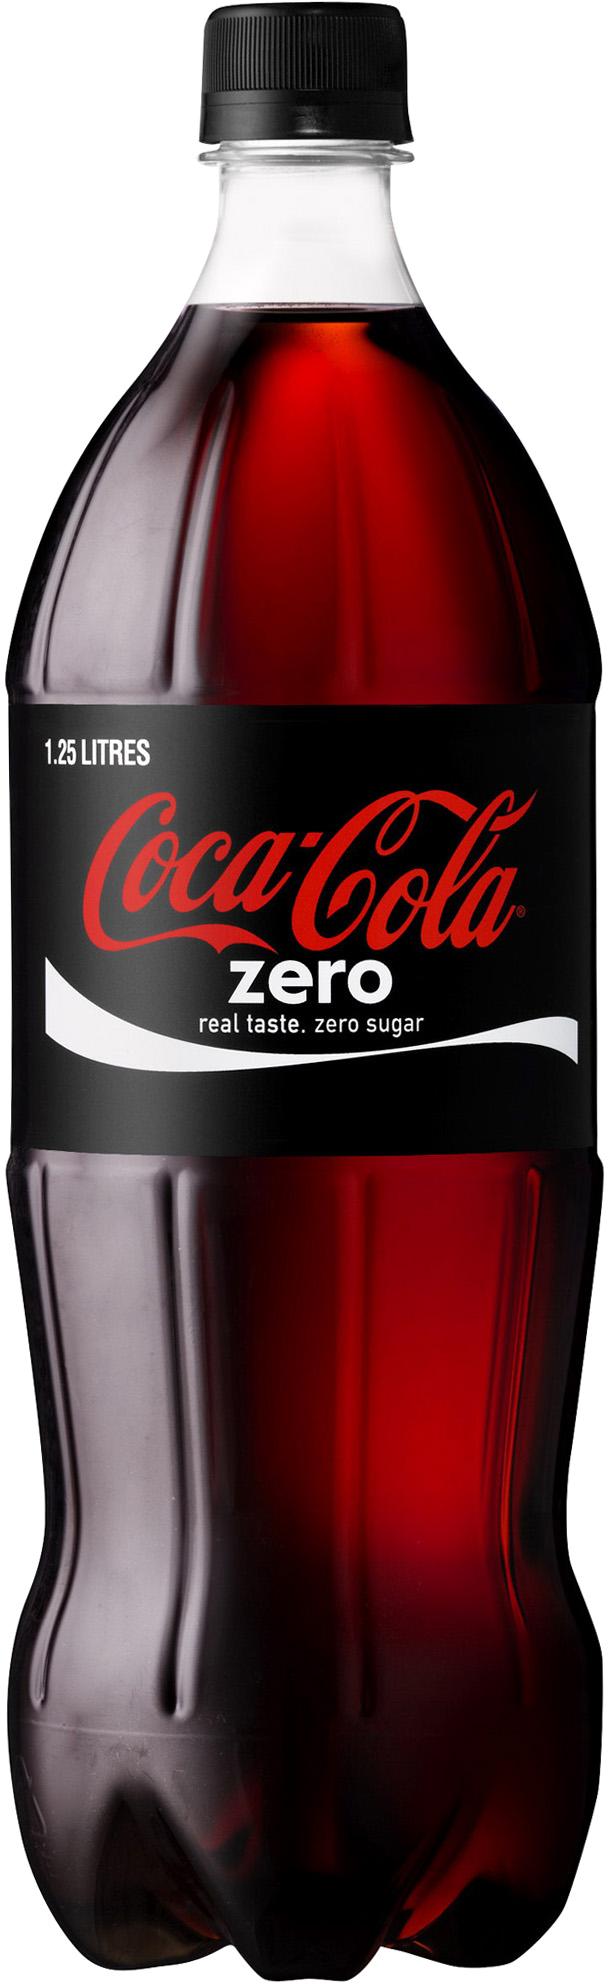 drinks clipart cold drink bottle